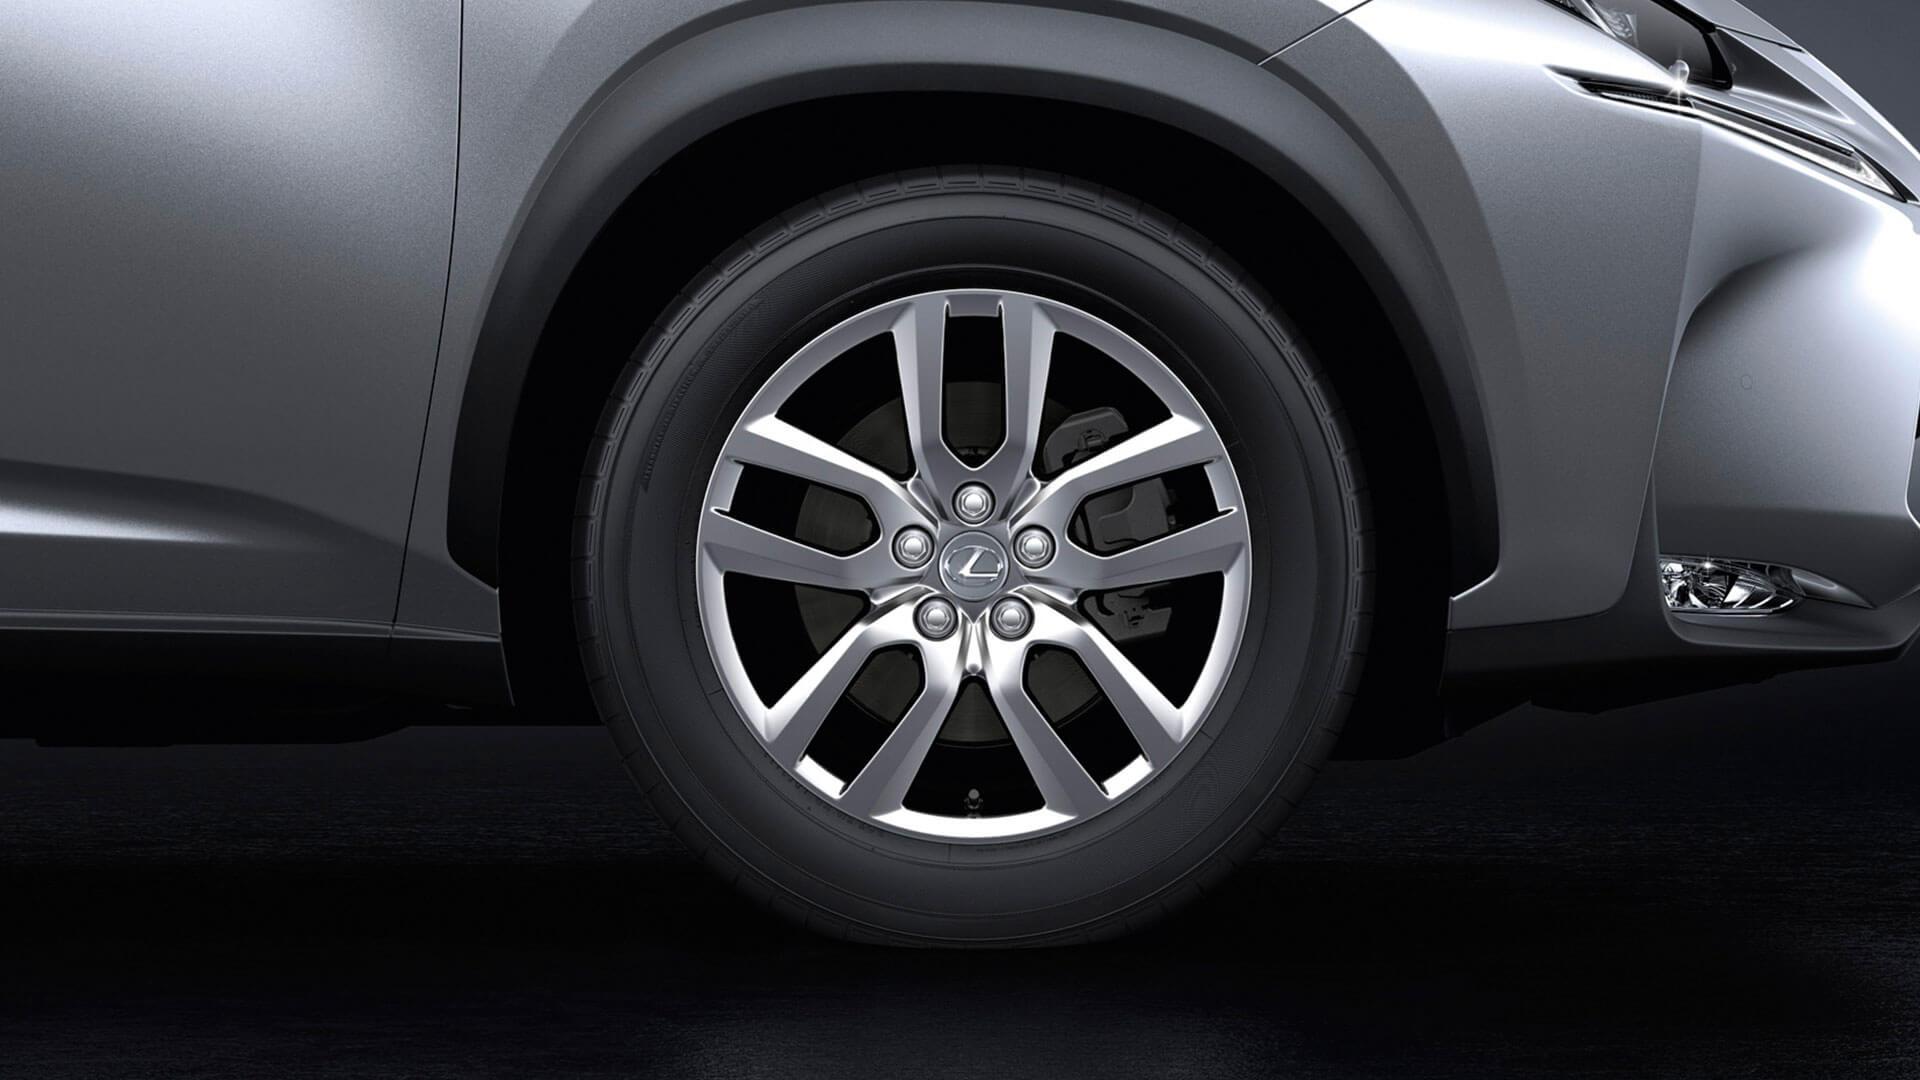 2017 lexus nx 200t features alloy wheels